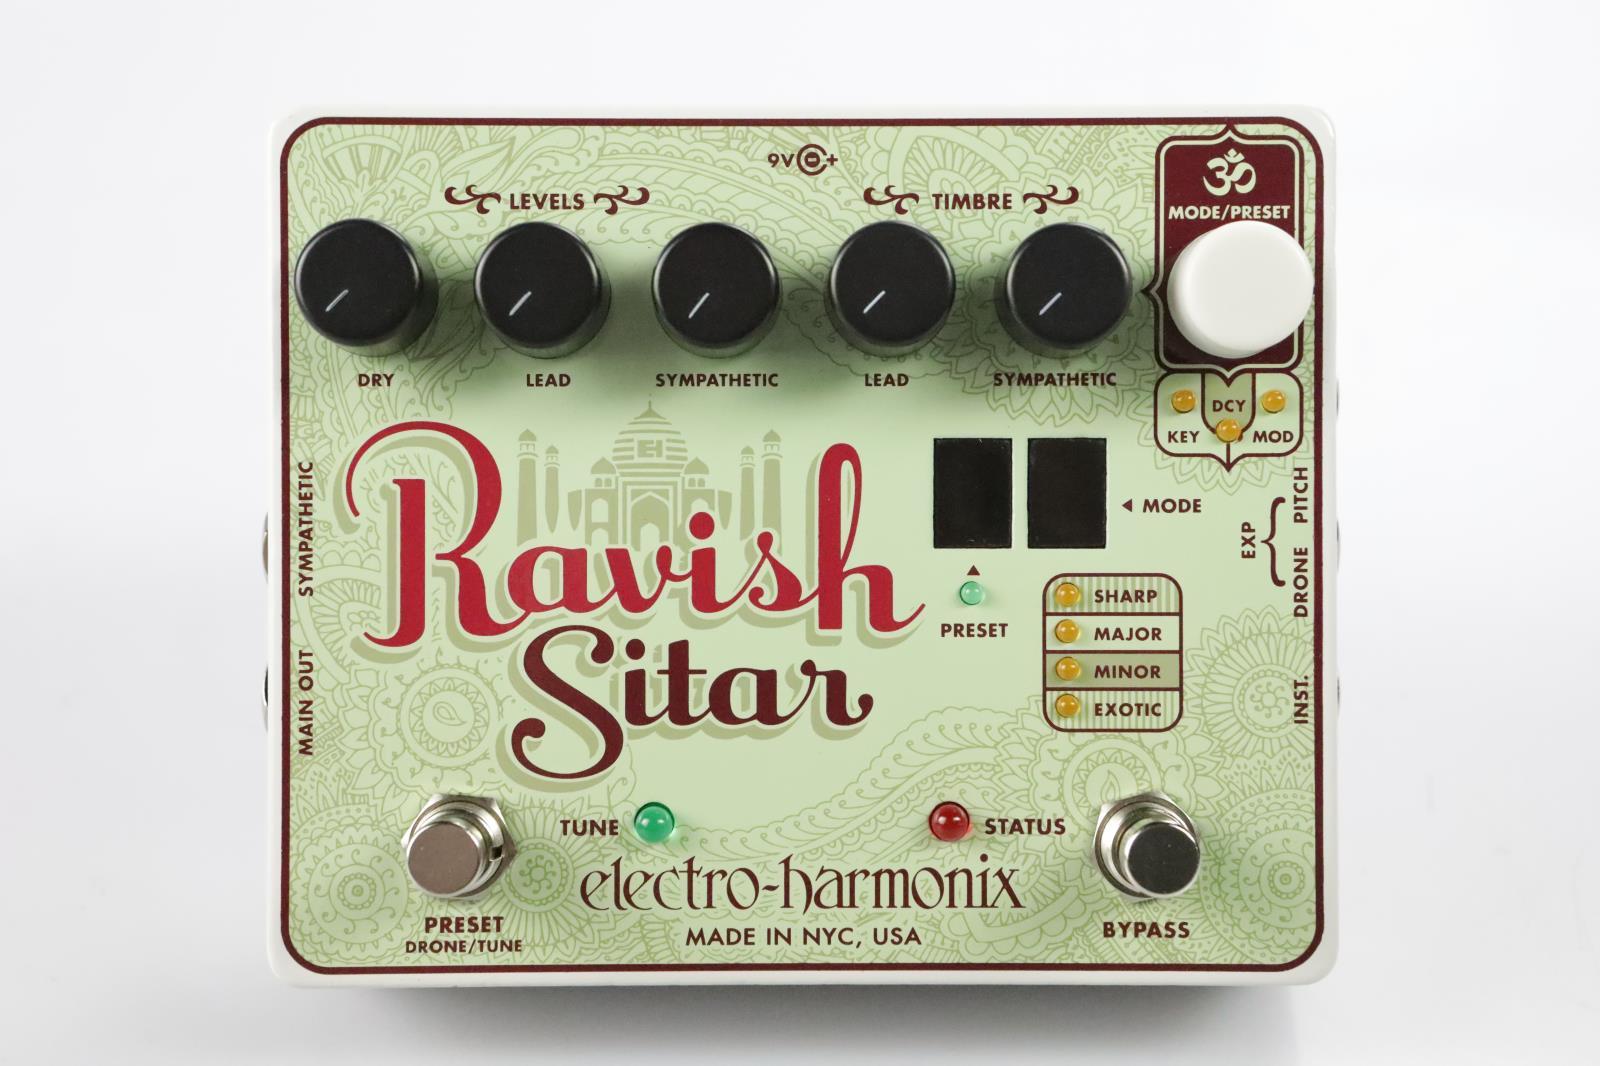 Electro Harmonix Ravish Sitar Guitar Pedal Signed Bruce Kulick Kiss #34410